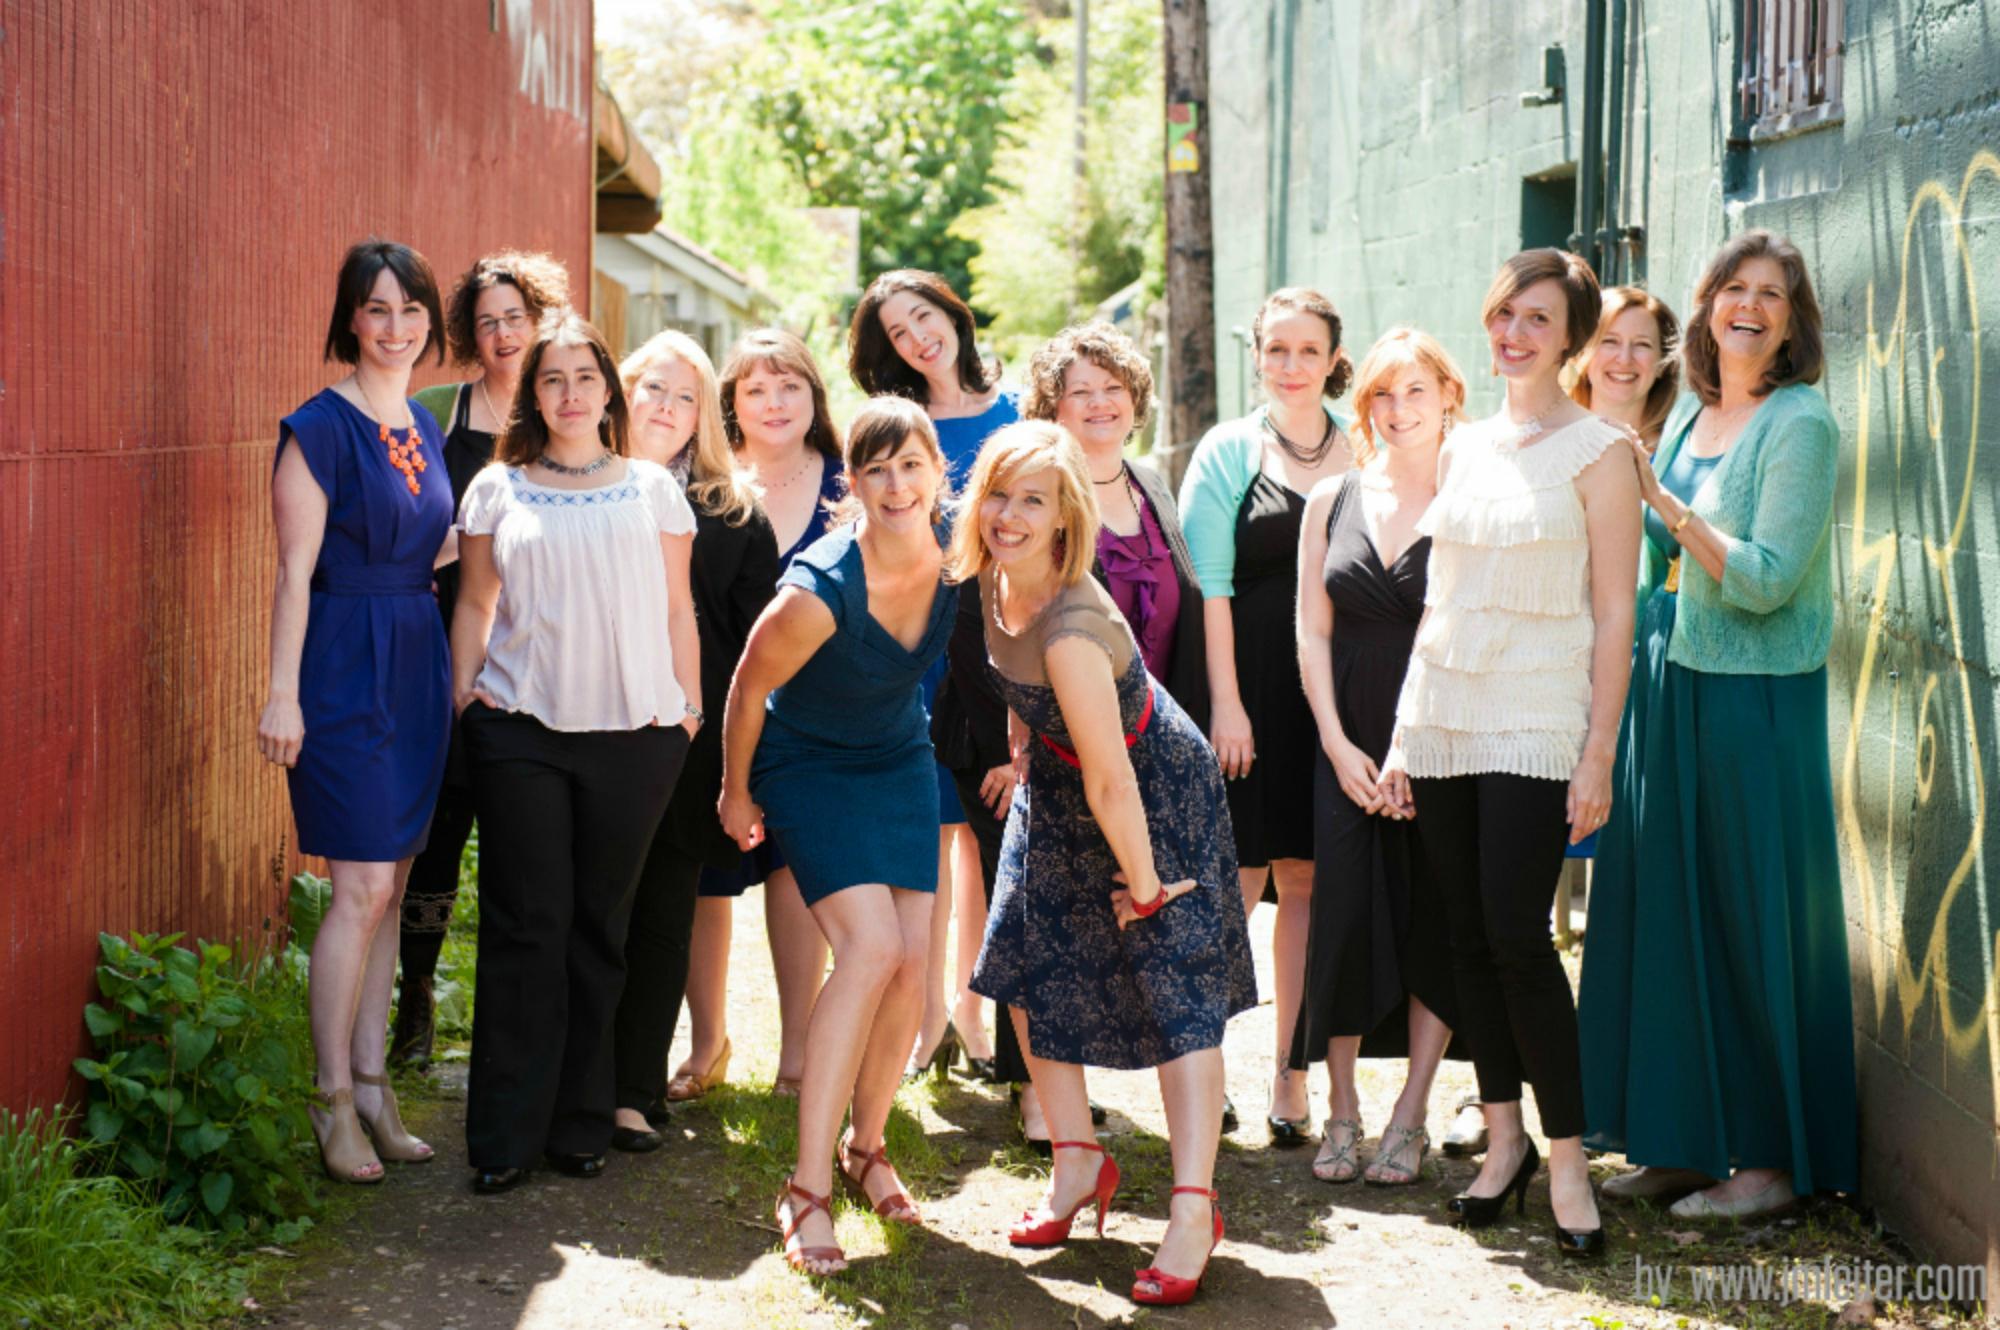 The cast of LTYM: Portland 2014.